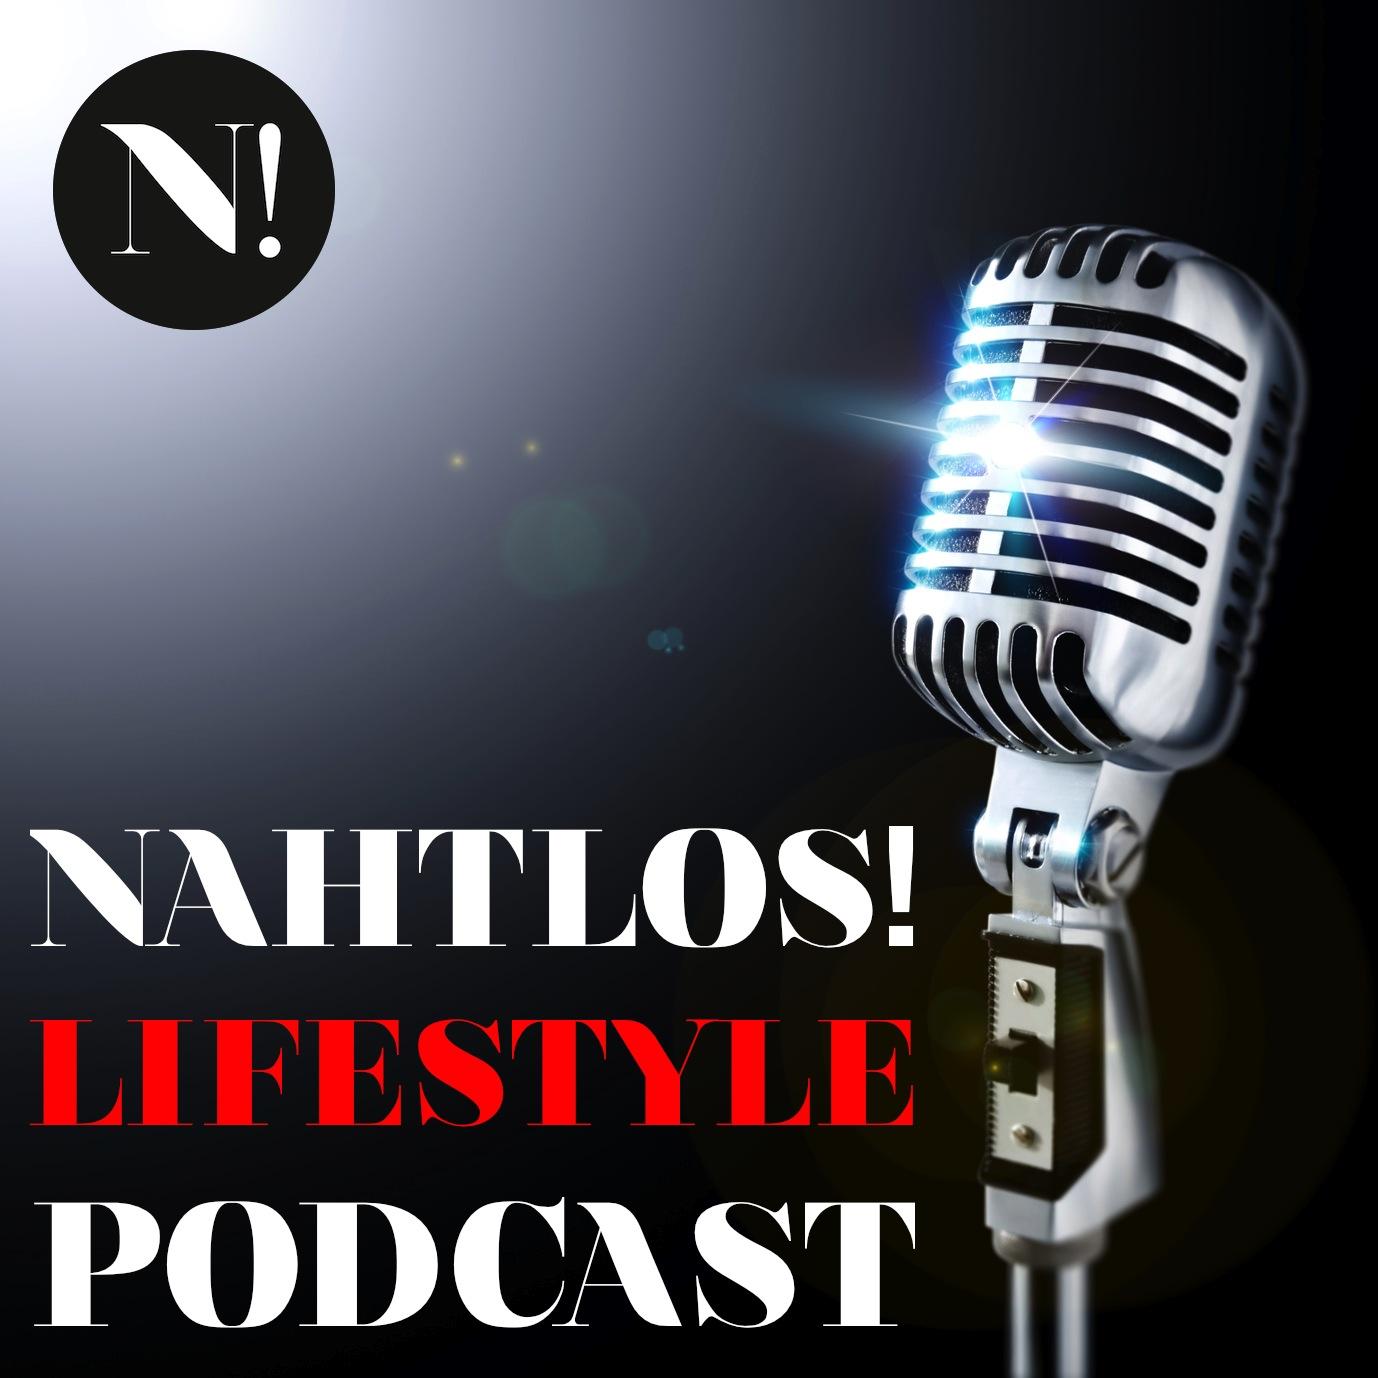 Nahtlos! Lifestyle Podcast, Folge 6/2011: Absolutely Fabulous, Jake Owen, Toni Sailer, Aigle, Revenge und Christian Wulff